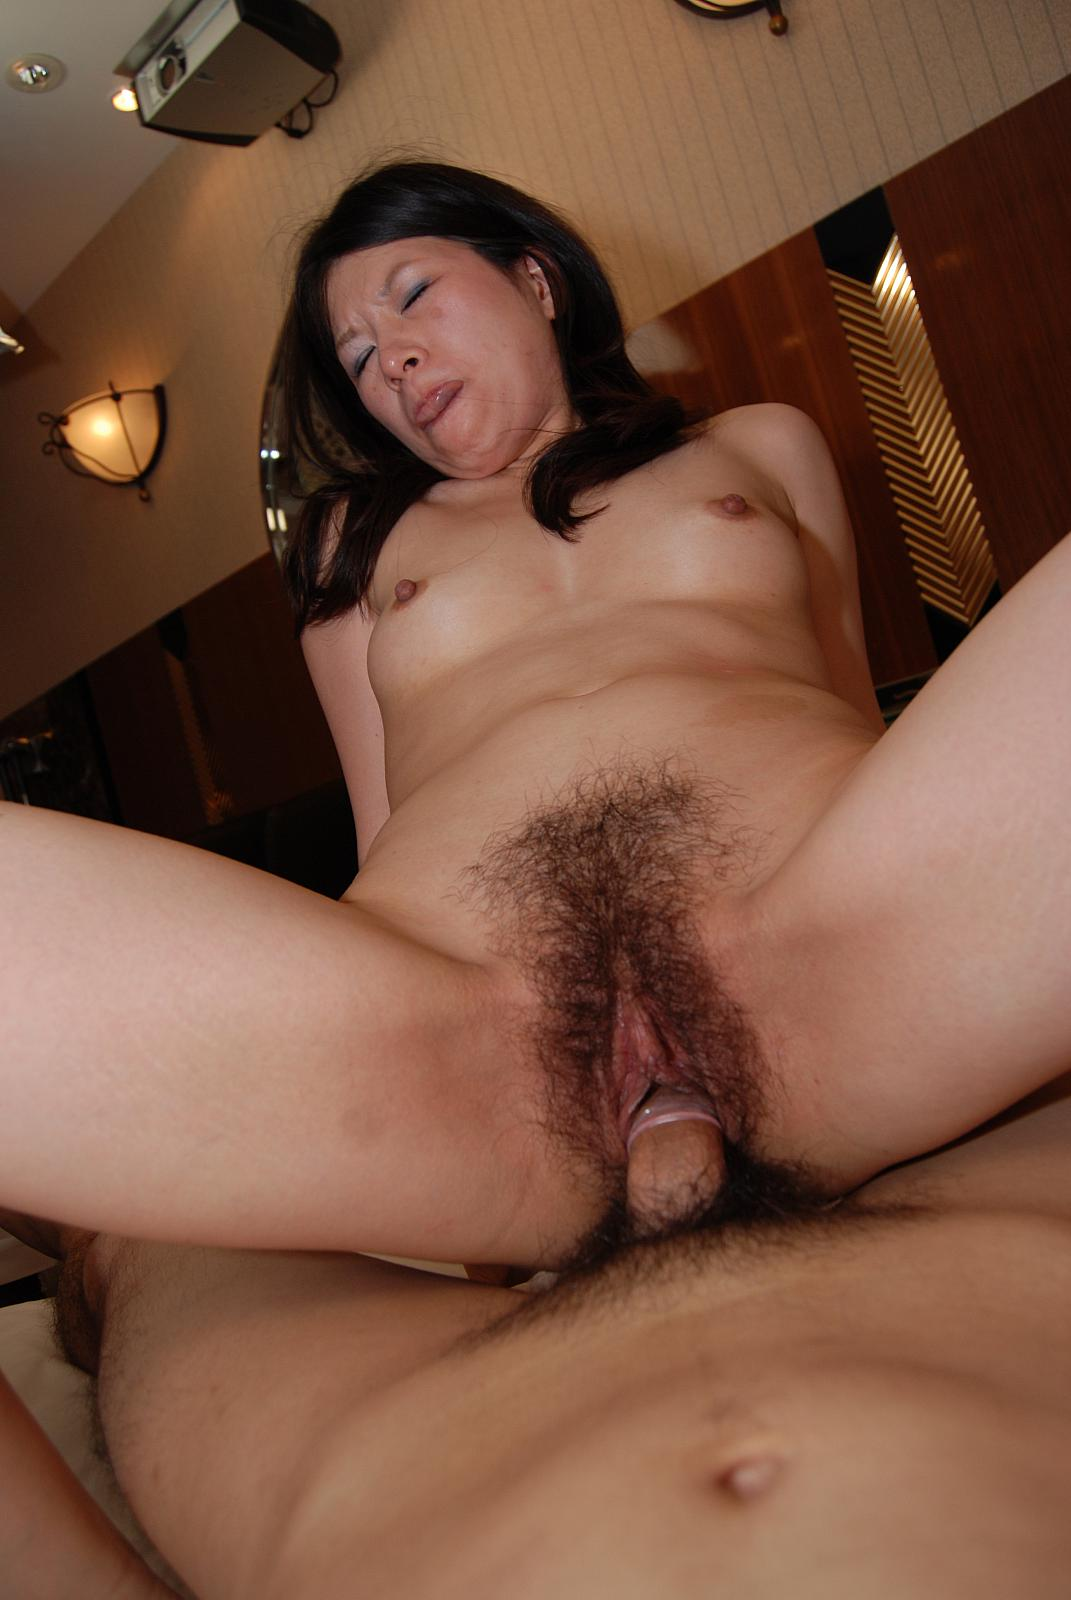 Amateur Seduce Porn get japanese hairy mlf seduce porn for free   free download